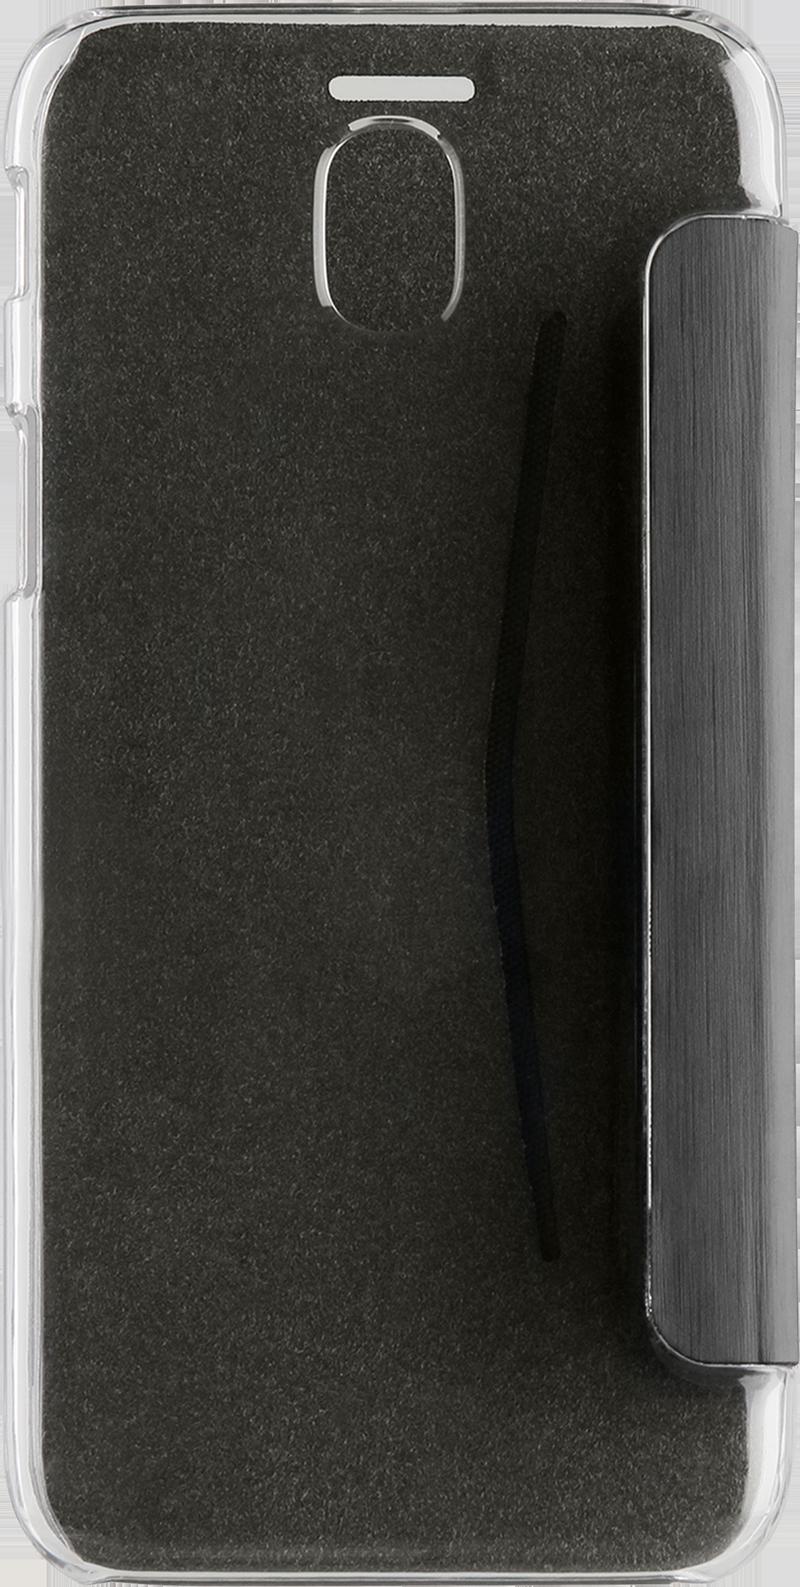 Etui folio Xqisit Galaxy J3 2017 noir